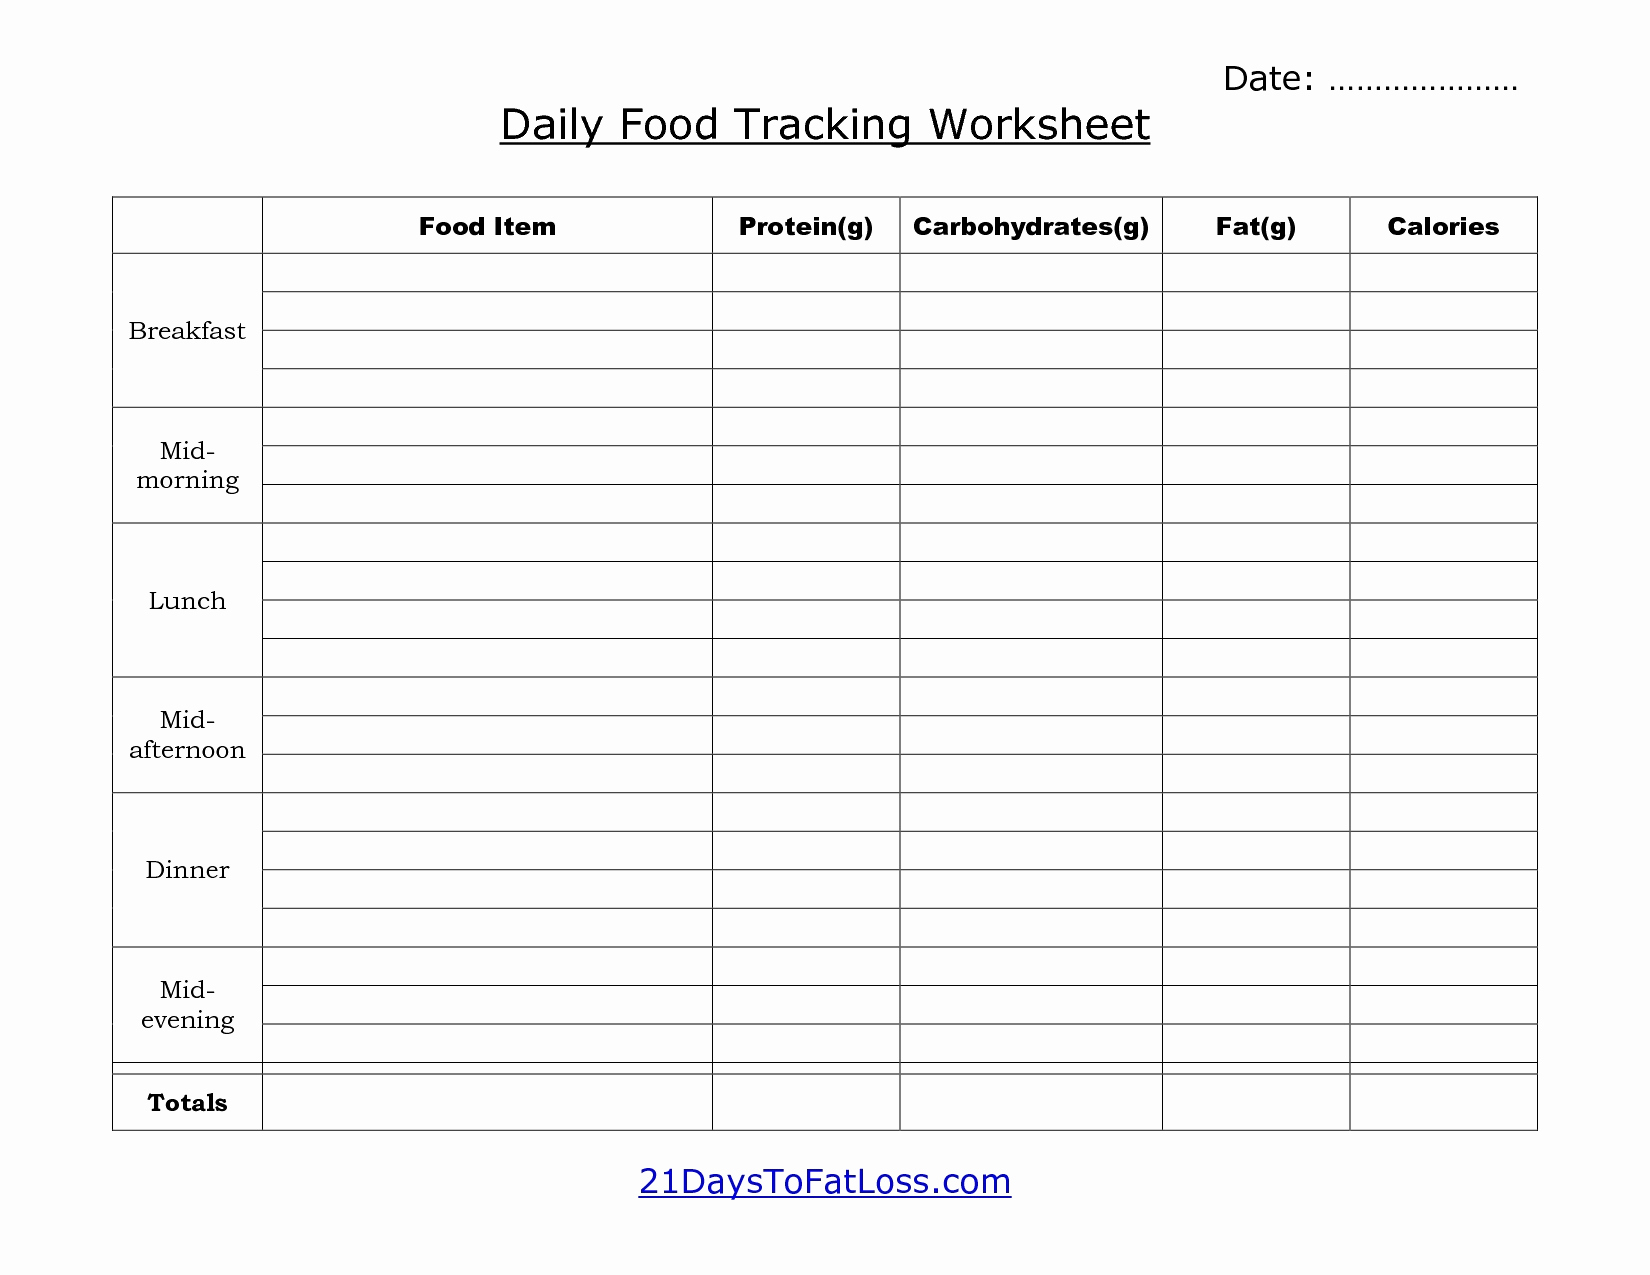 Calorie Spreadsheet Template In 50 Unique Hcg Calorie Counter Spreadsheet Documents Ideas Excel